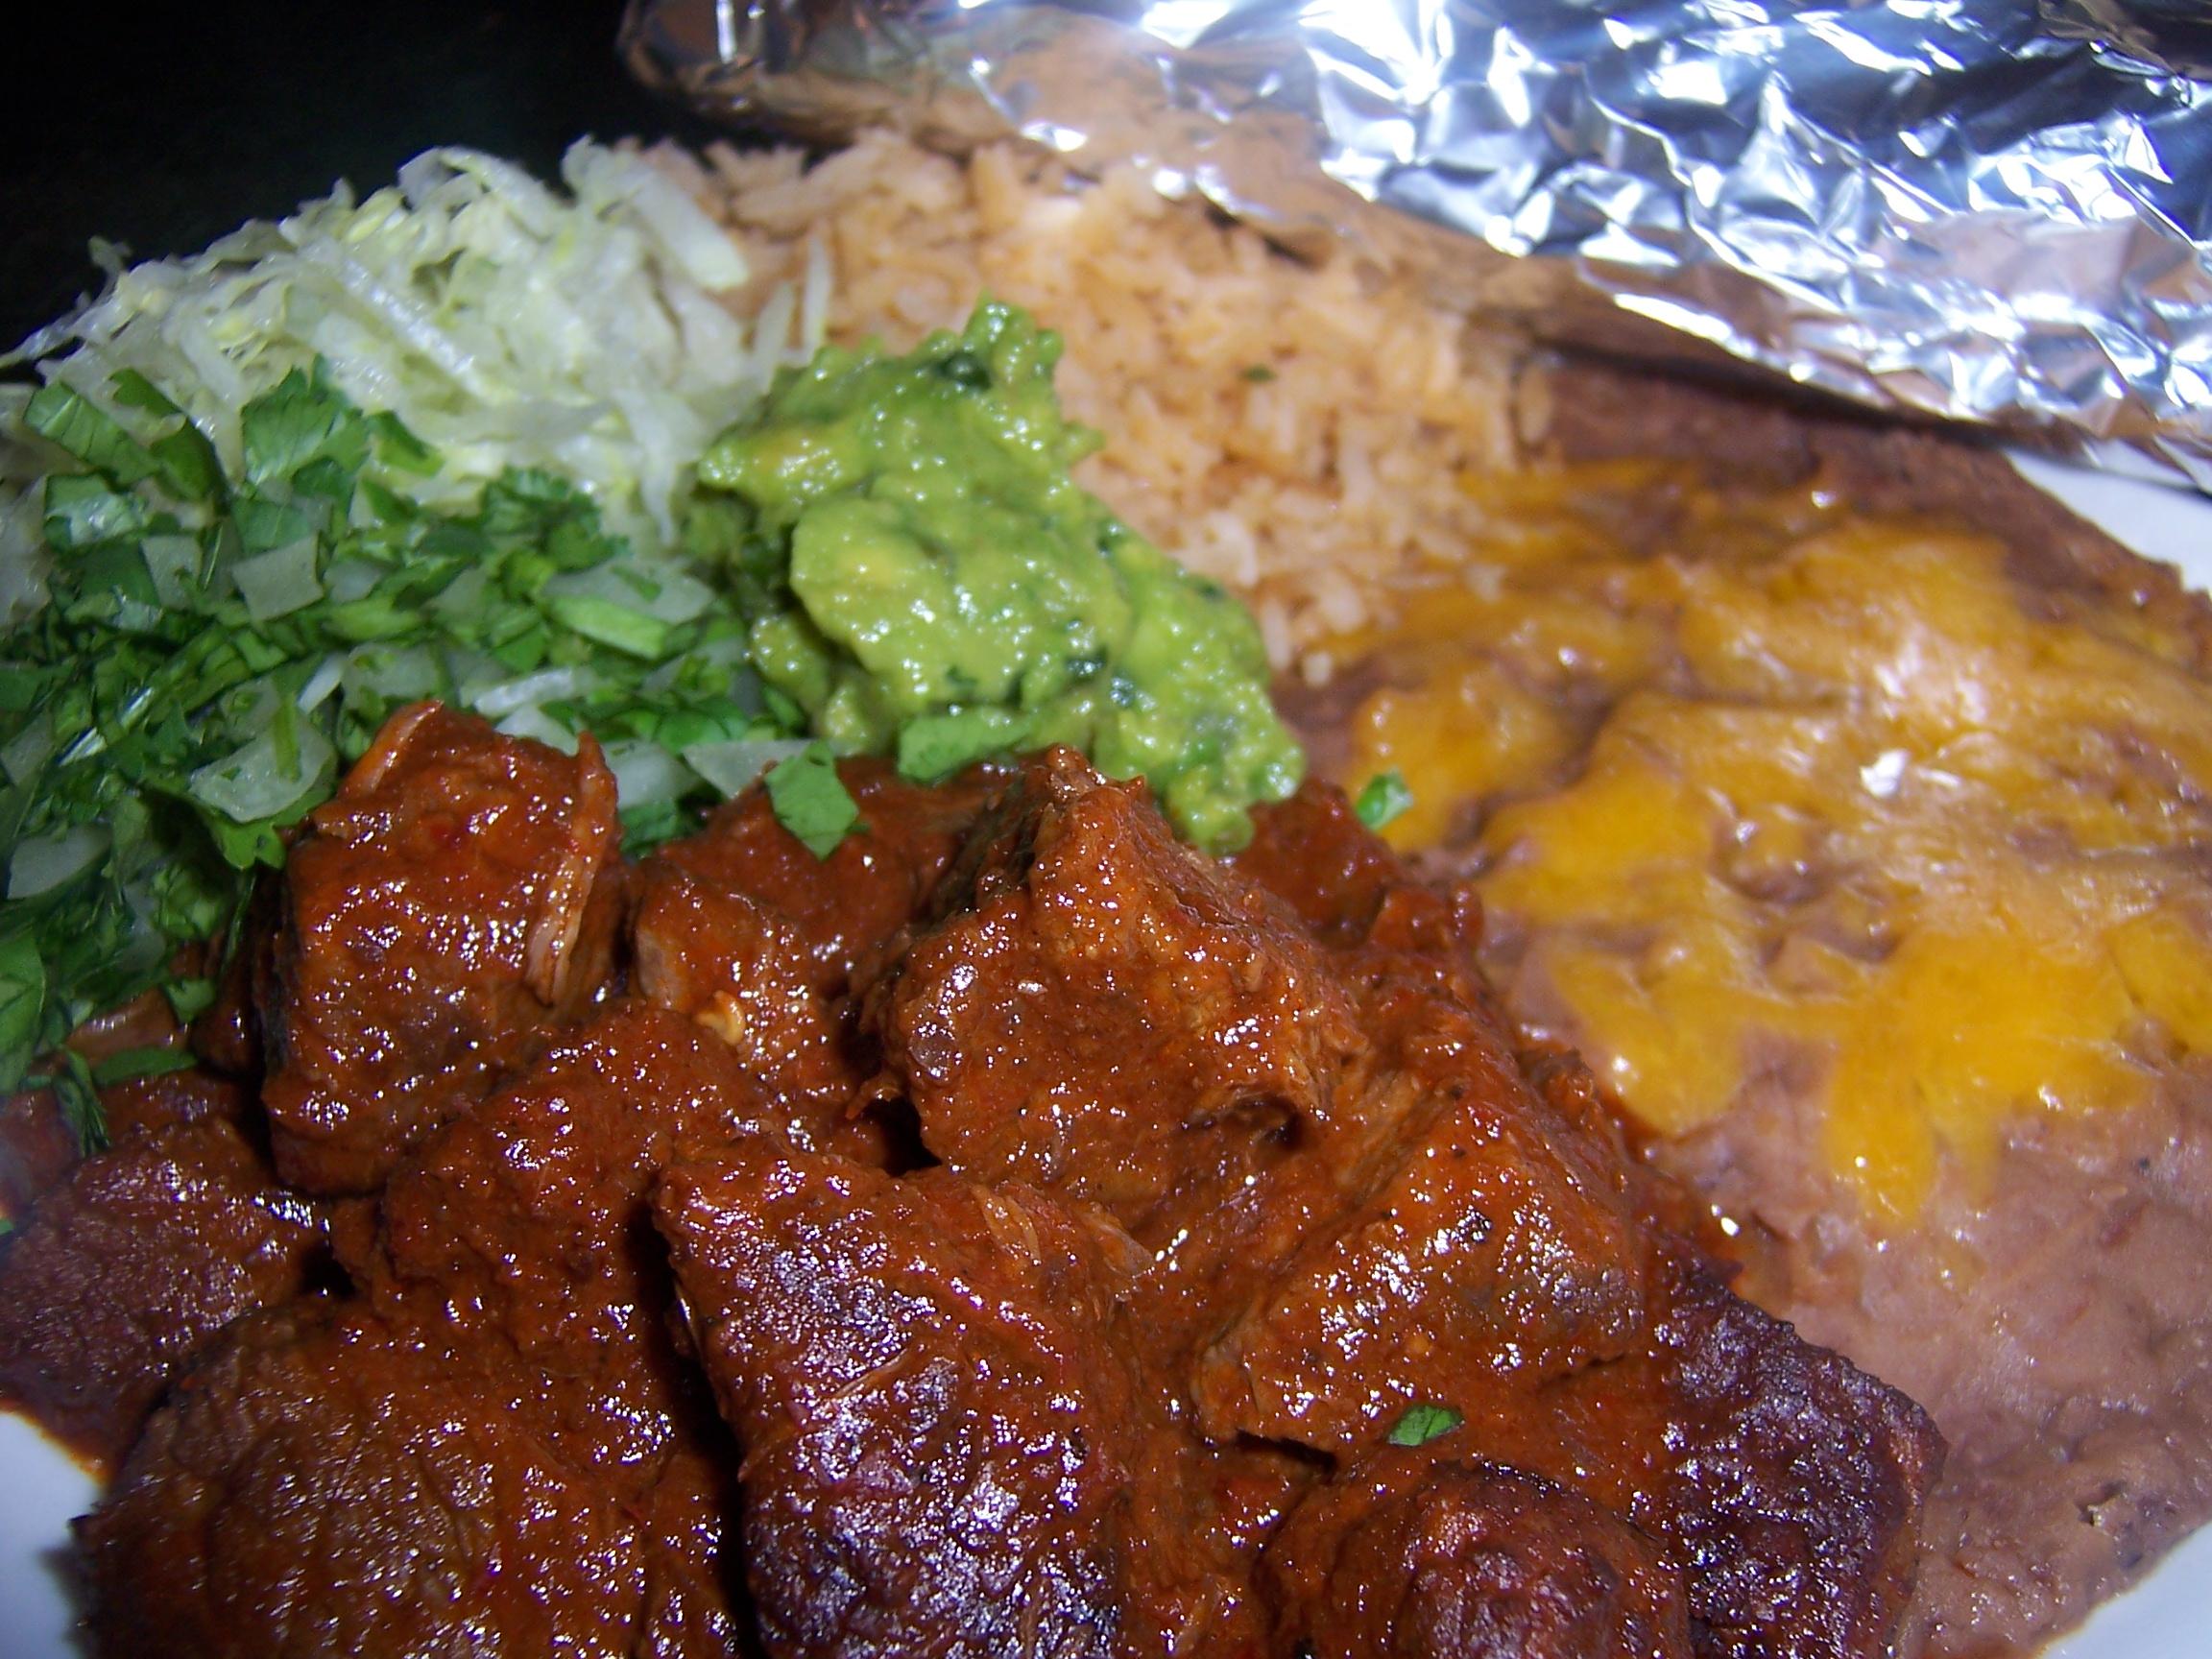 Chili Colorado Authentic Mexican Style